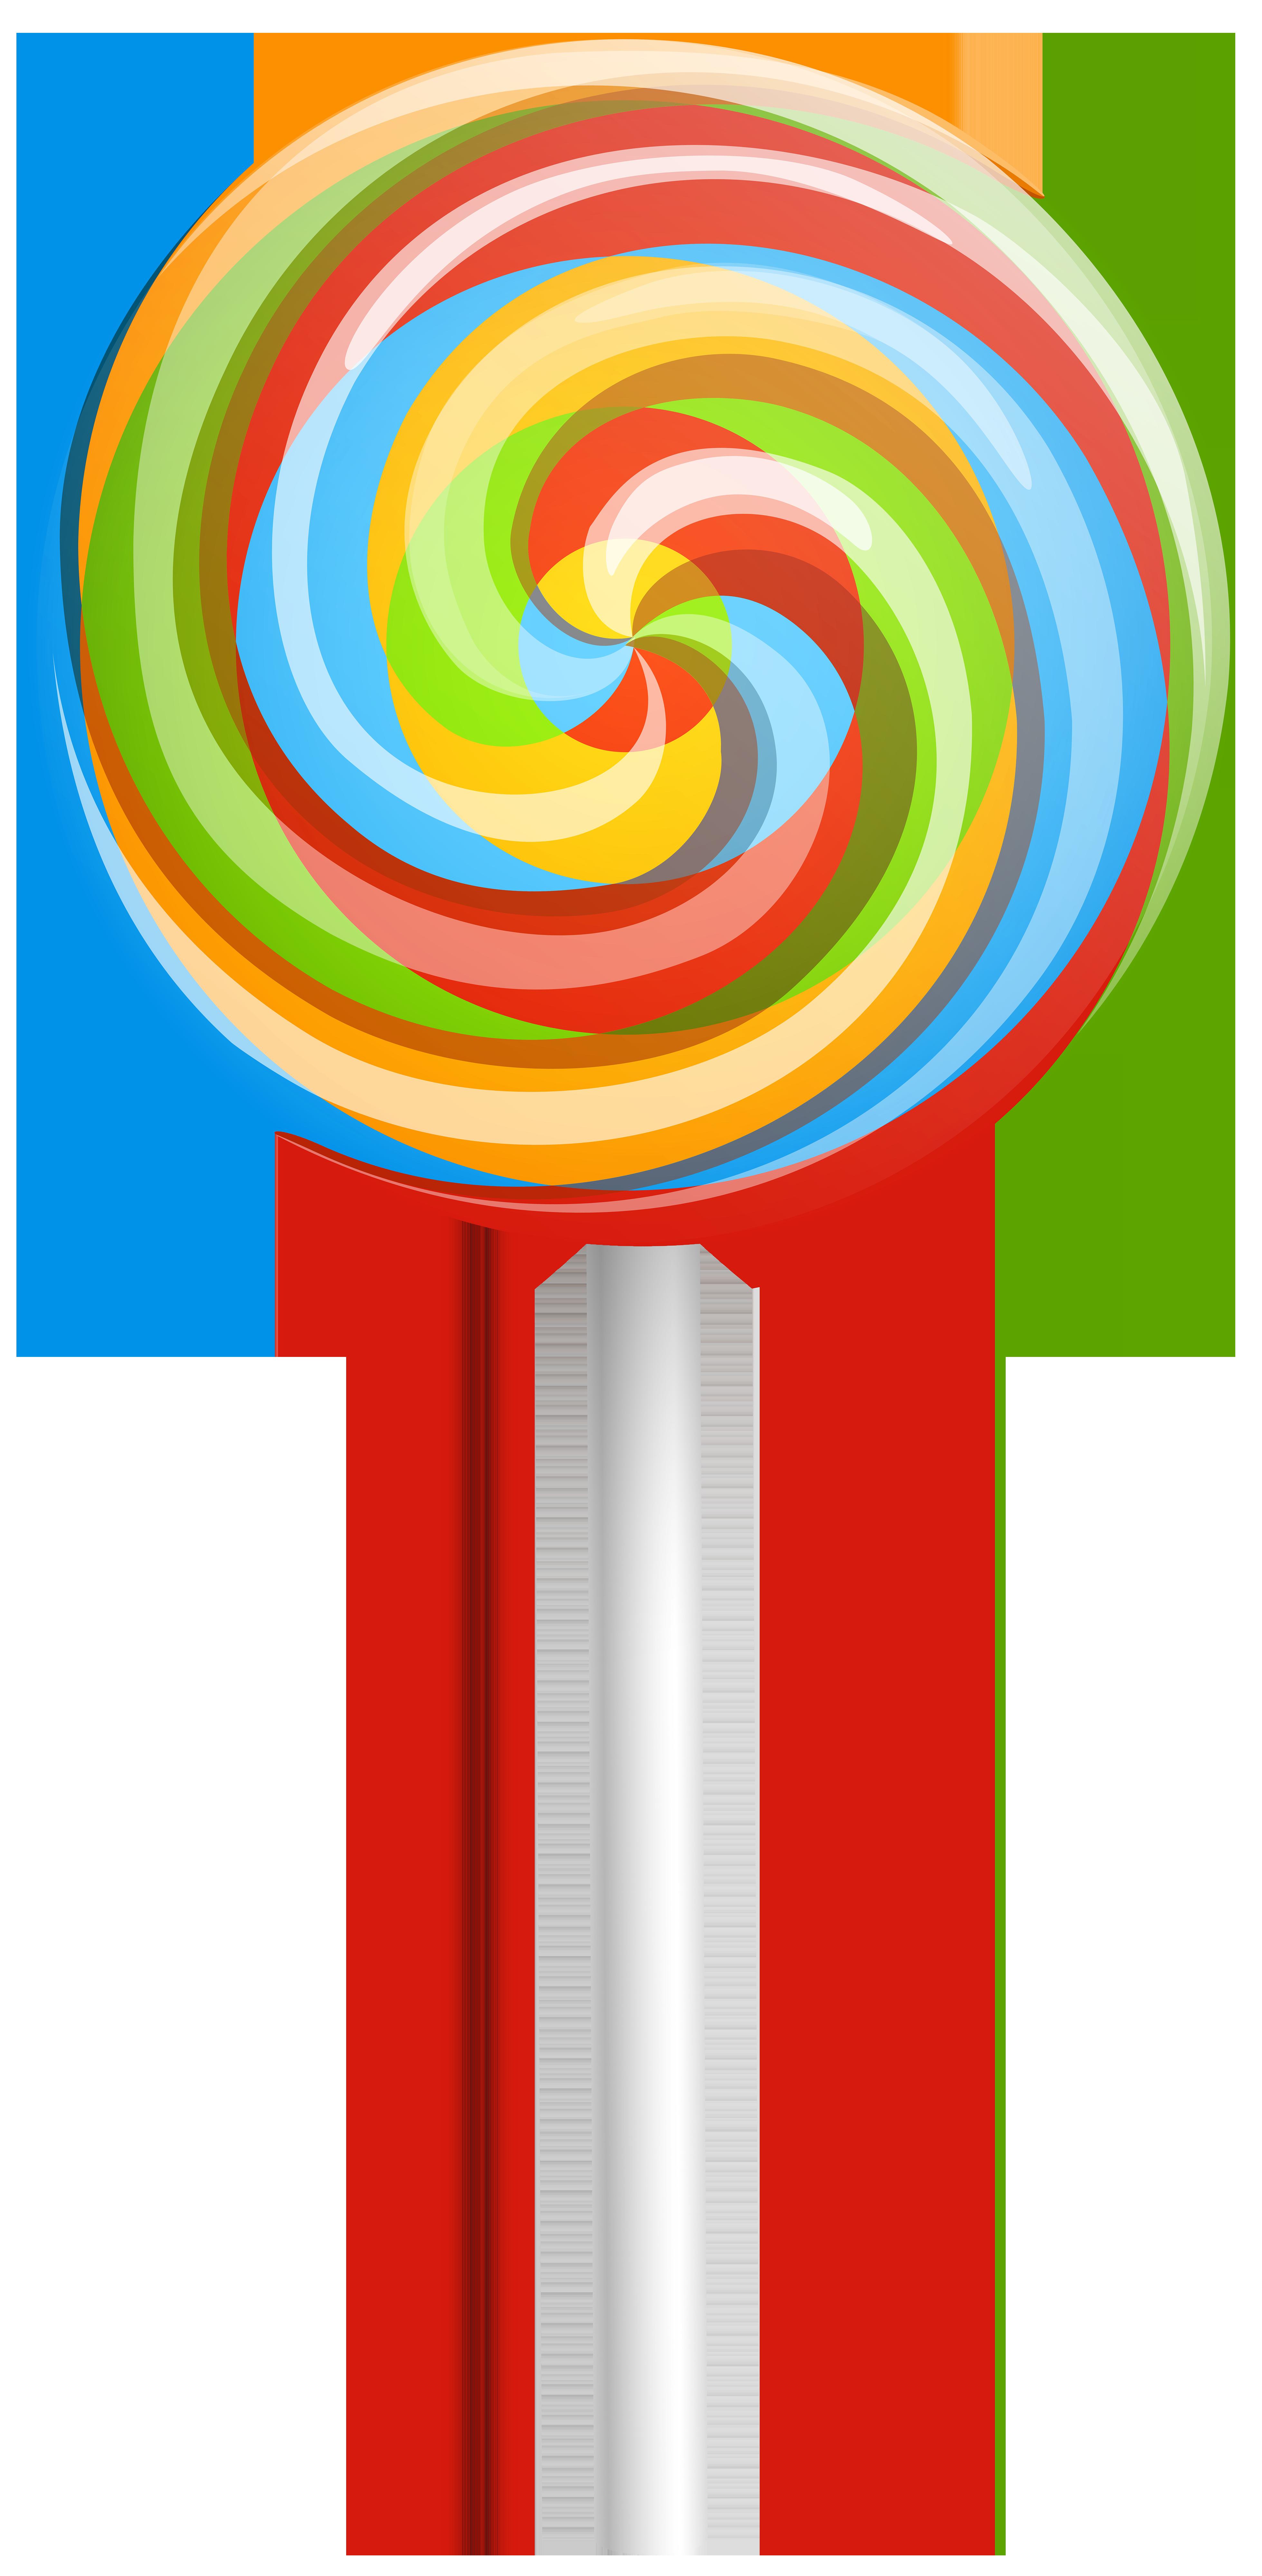 Lollipop clipart #17, Download drawings